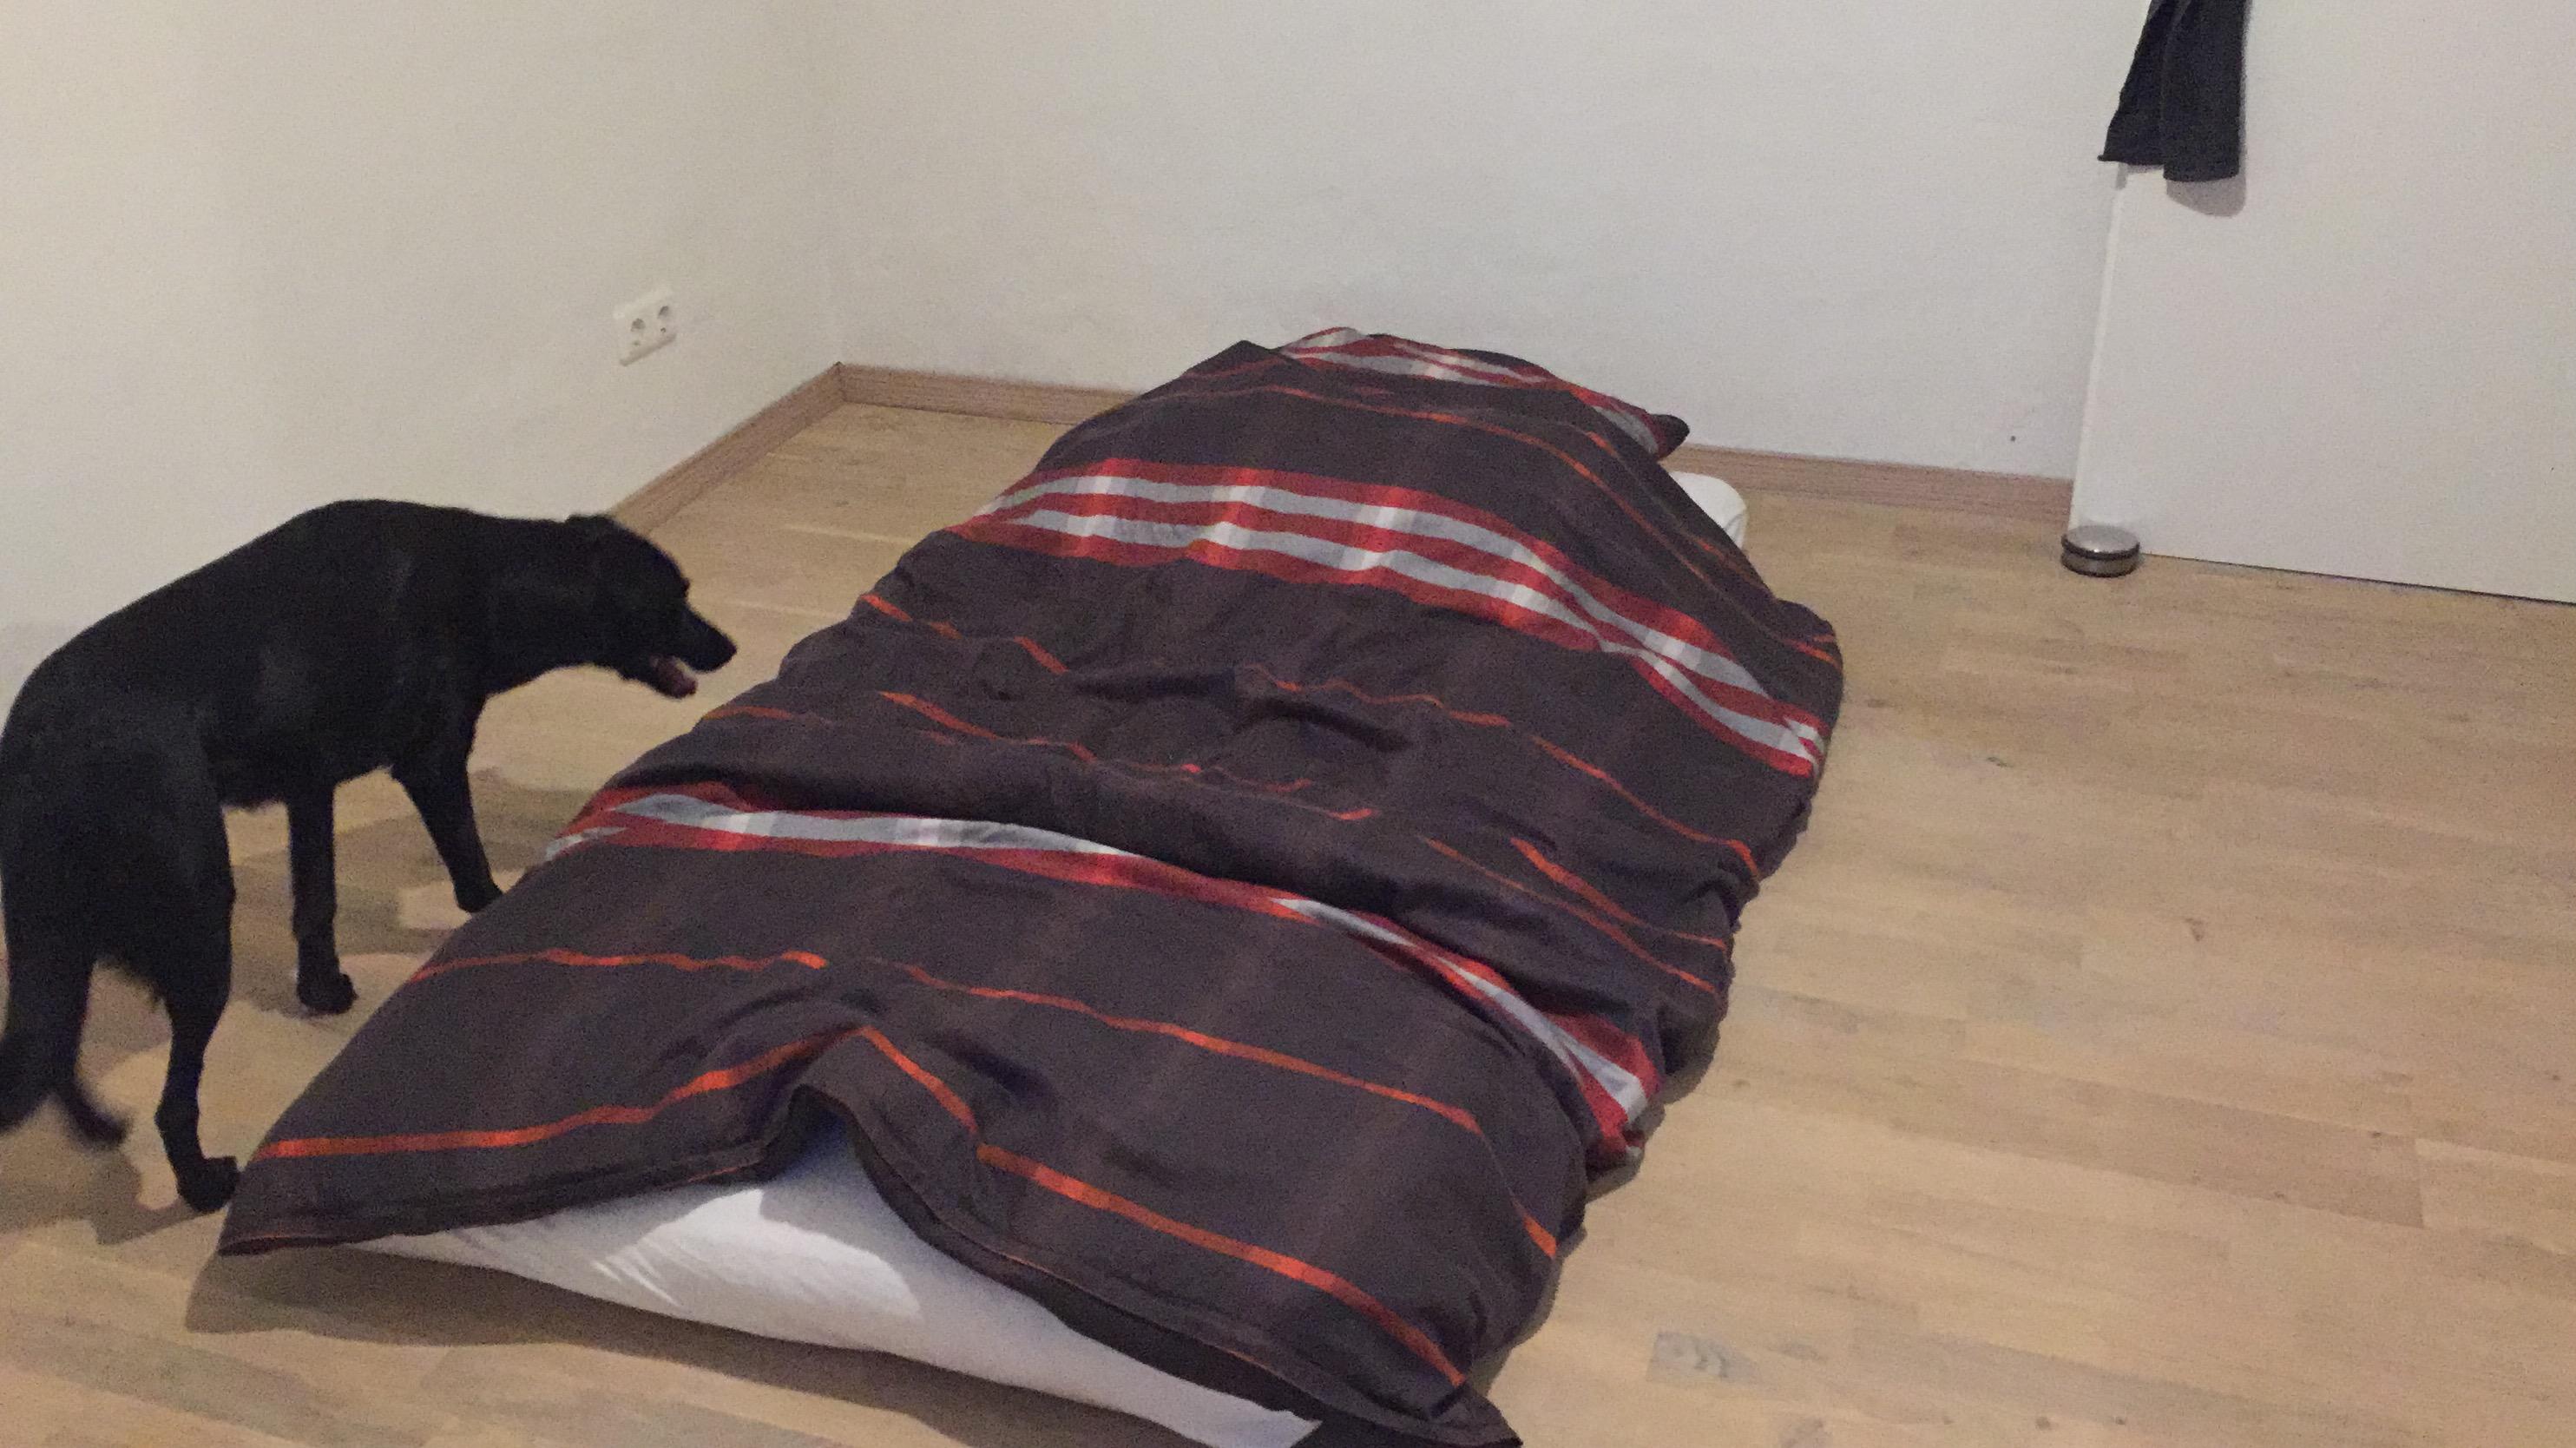 diy kotatsu ikea hack 8404. Black Bedroom Furniture Sets. Home Design Ideas